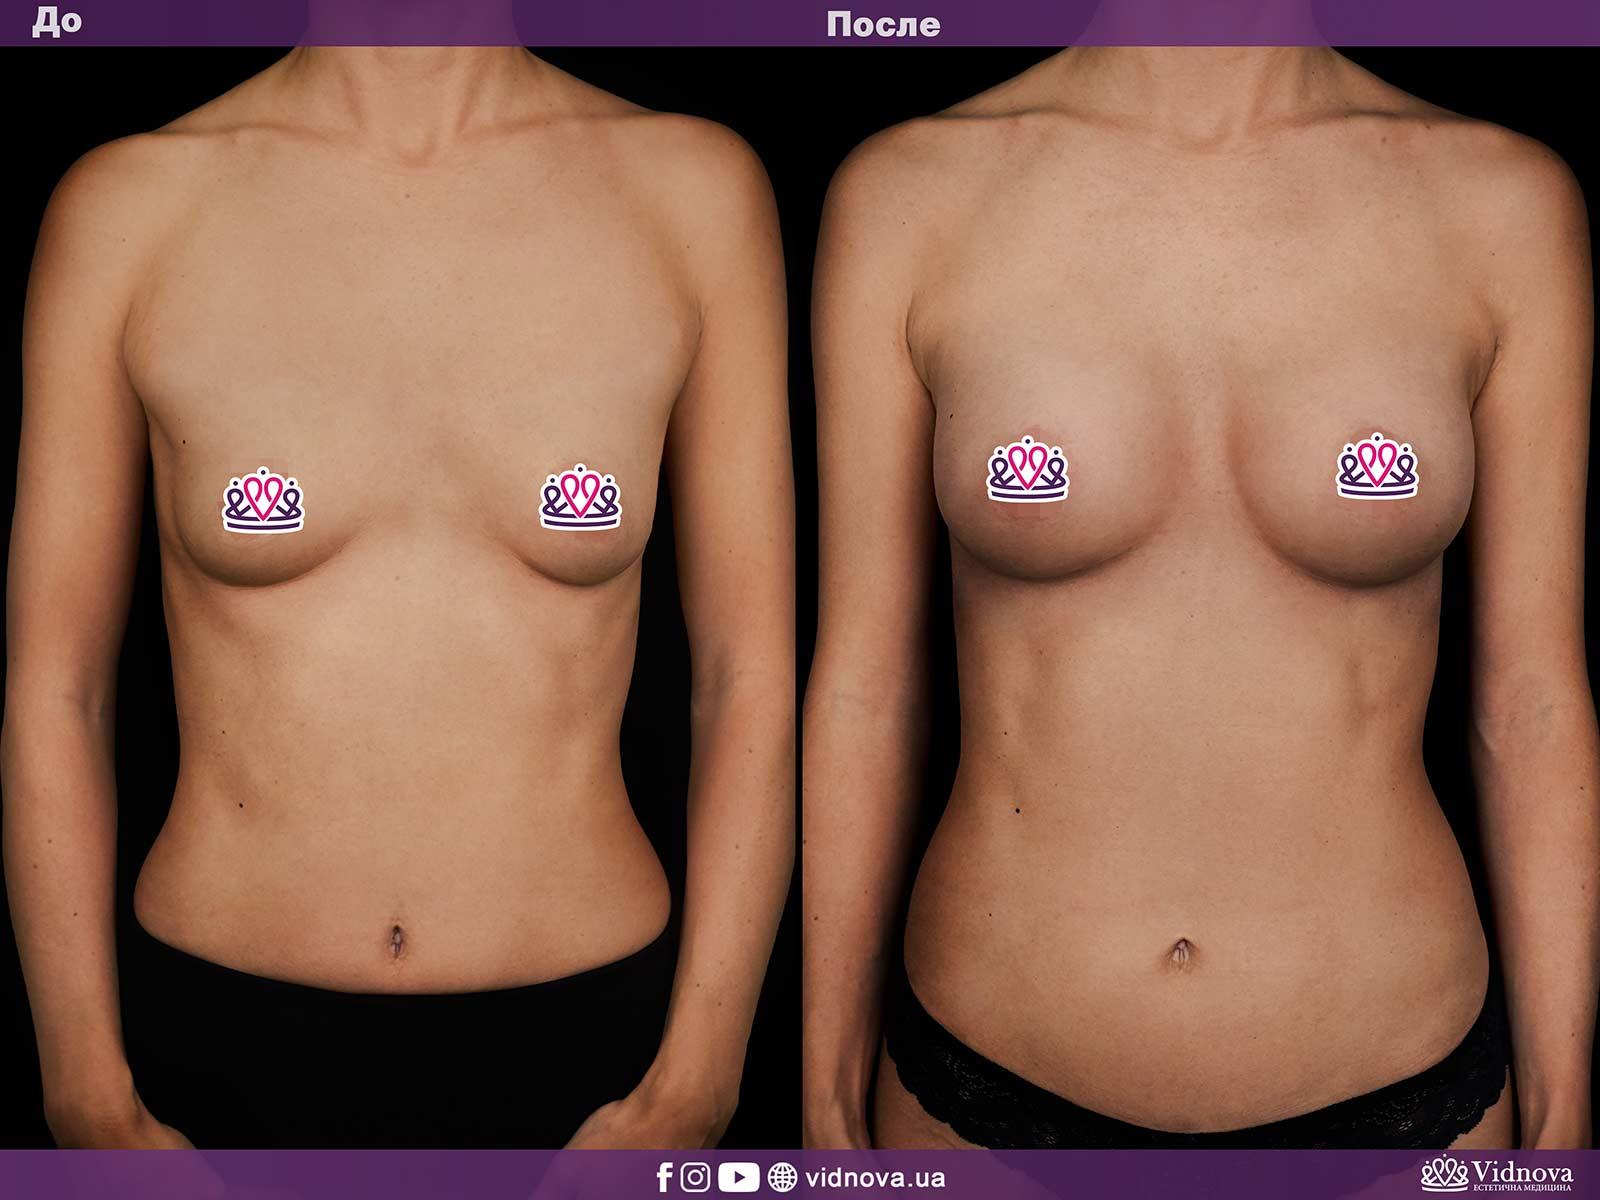 Увеличение груди: Фото ДО и ПОСЛЕ - Пример №2-1 - Клиника Vidnova